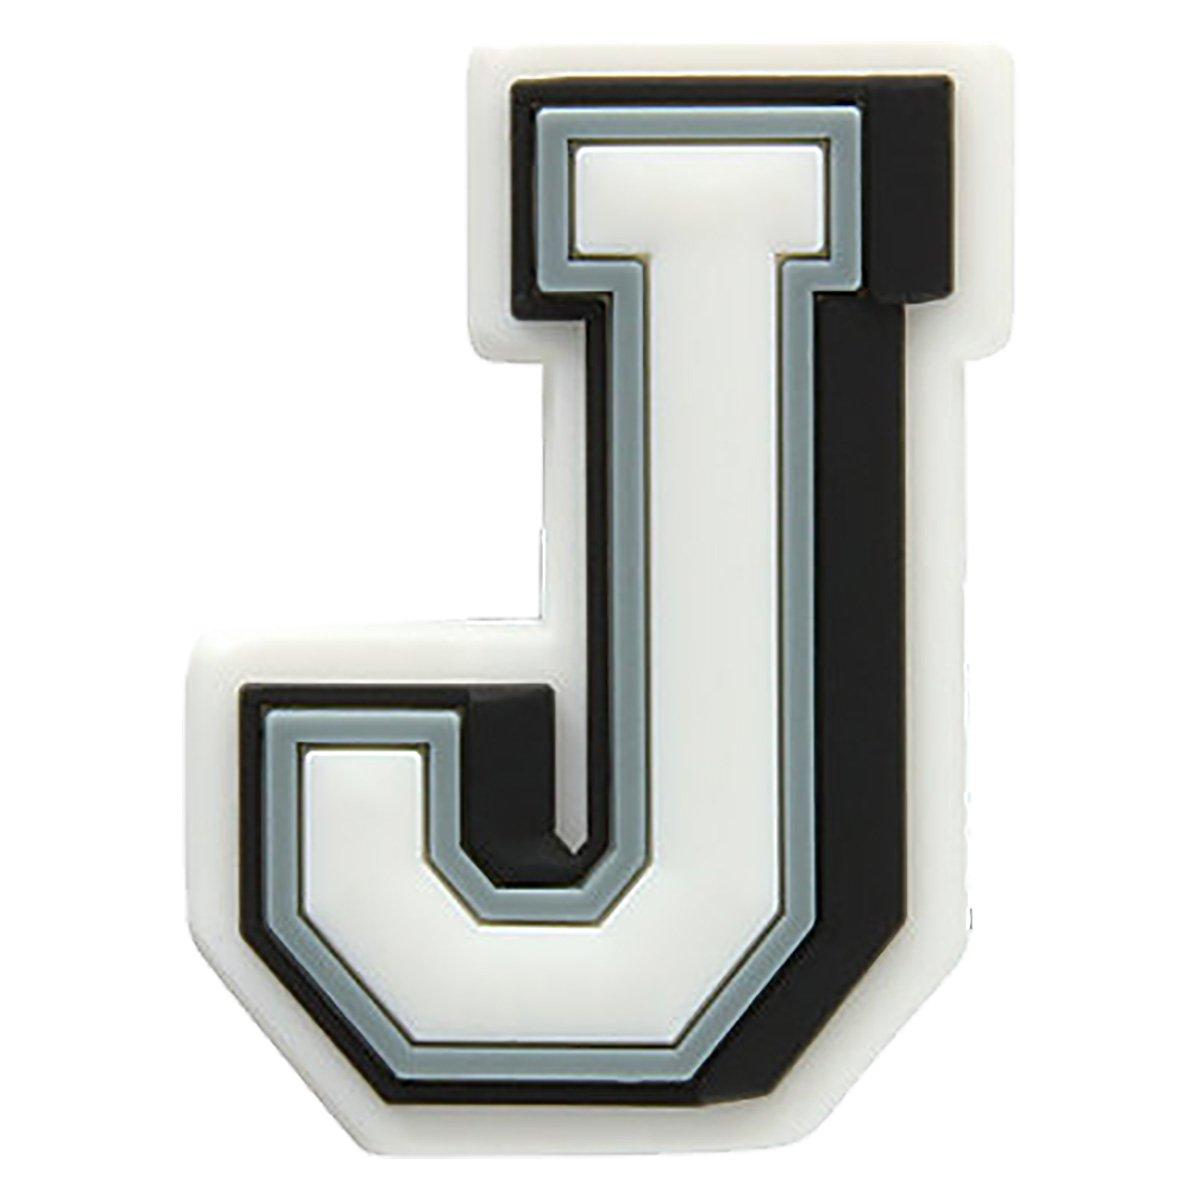 Jibbitz Crocs Letter J